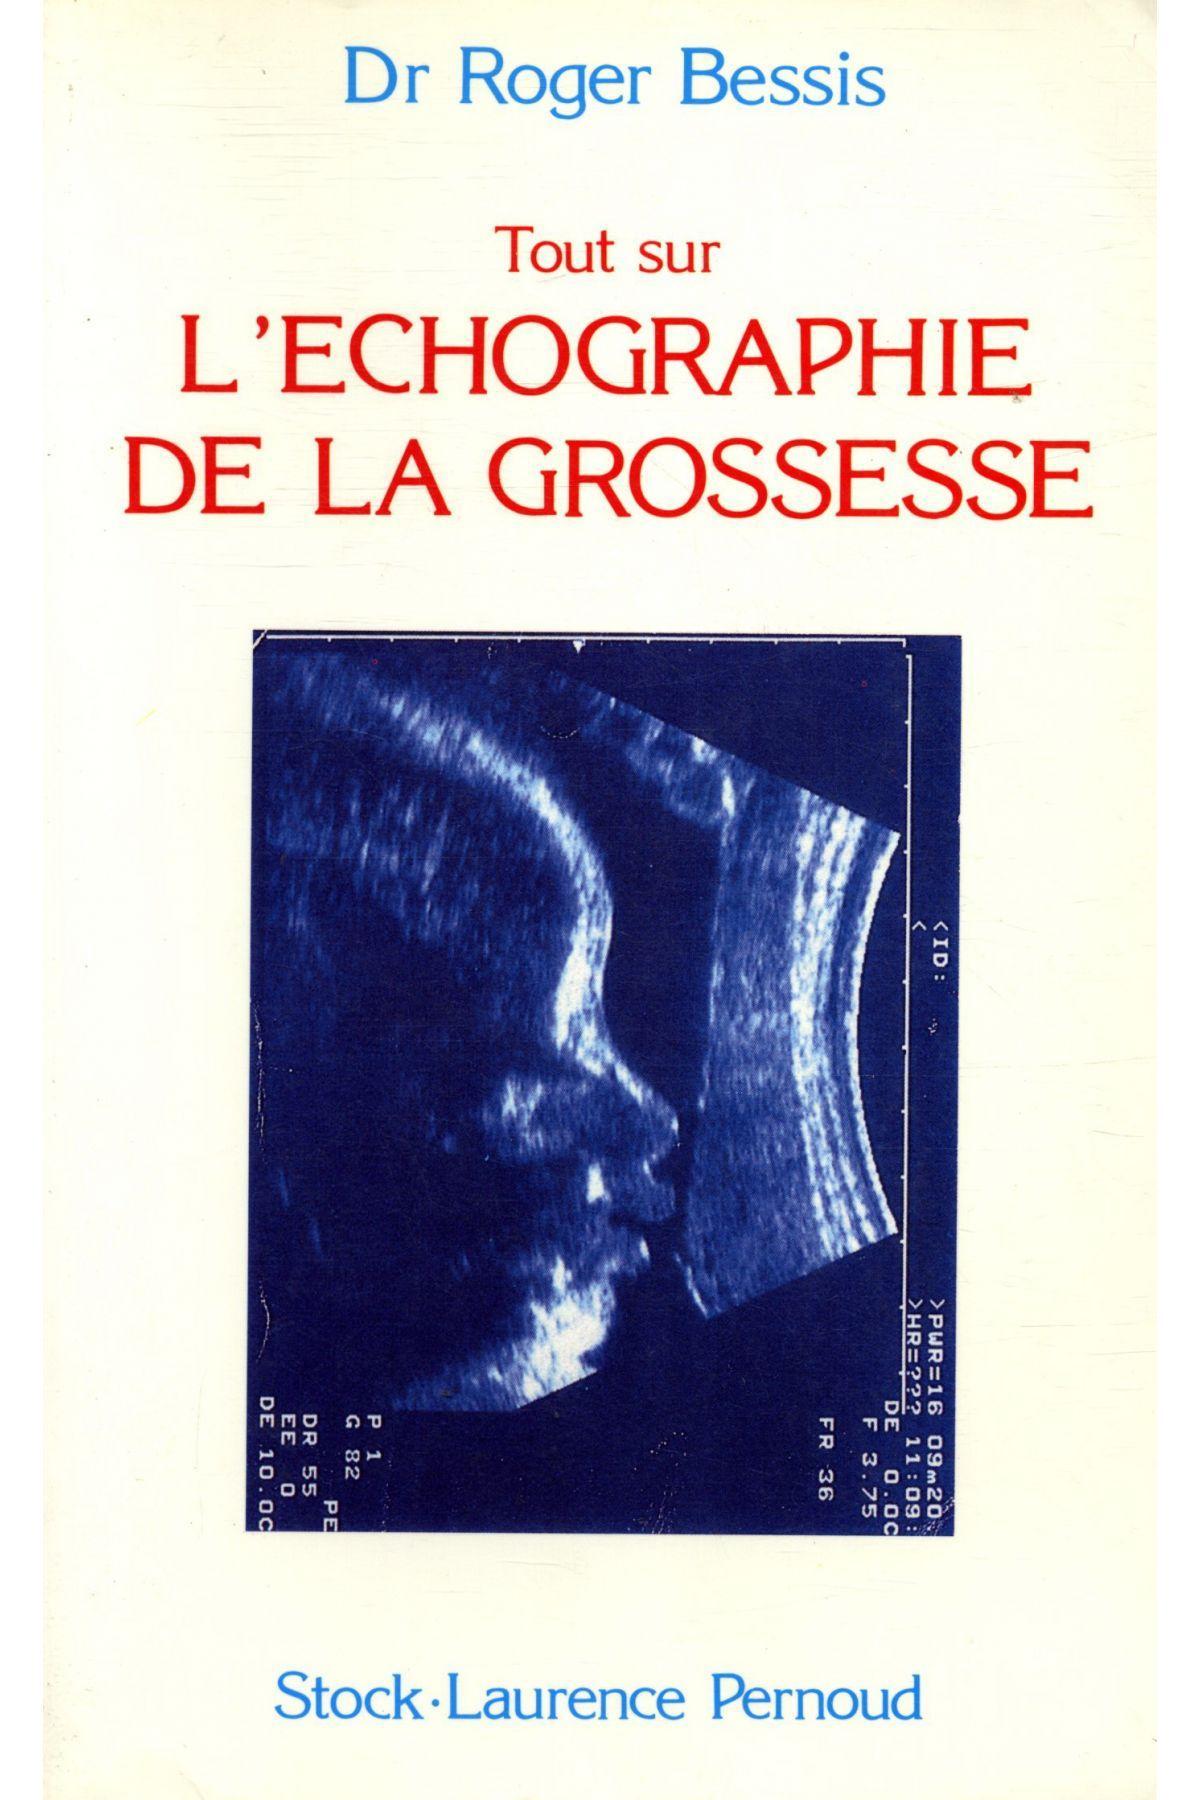 Bessis Livre France Loisirs